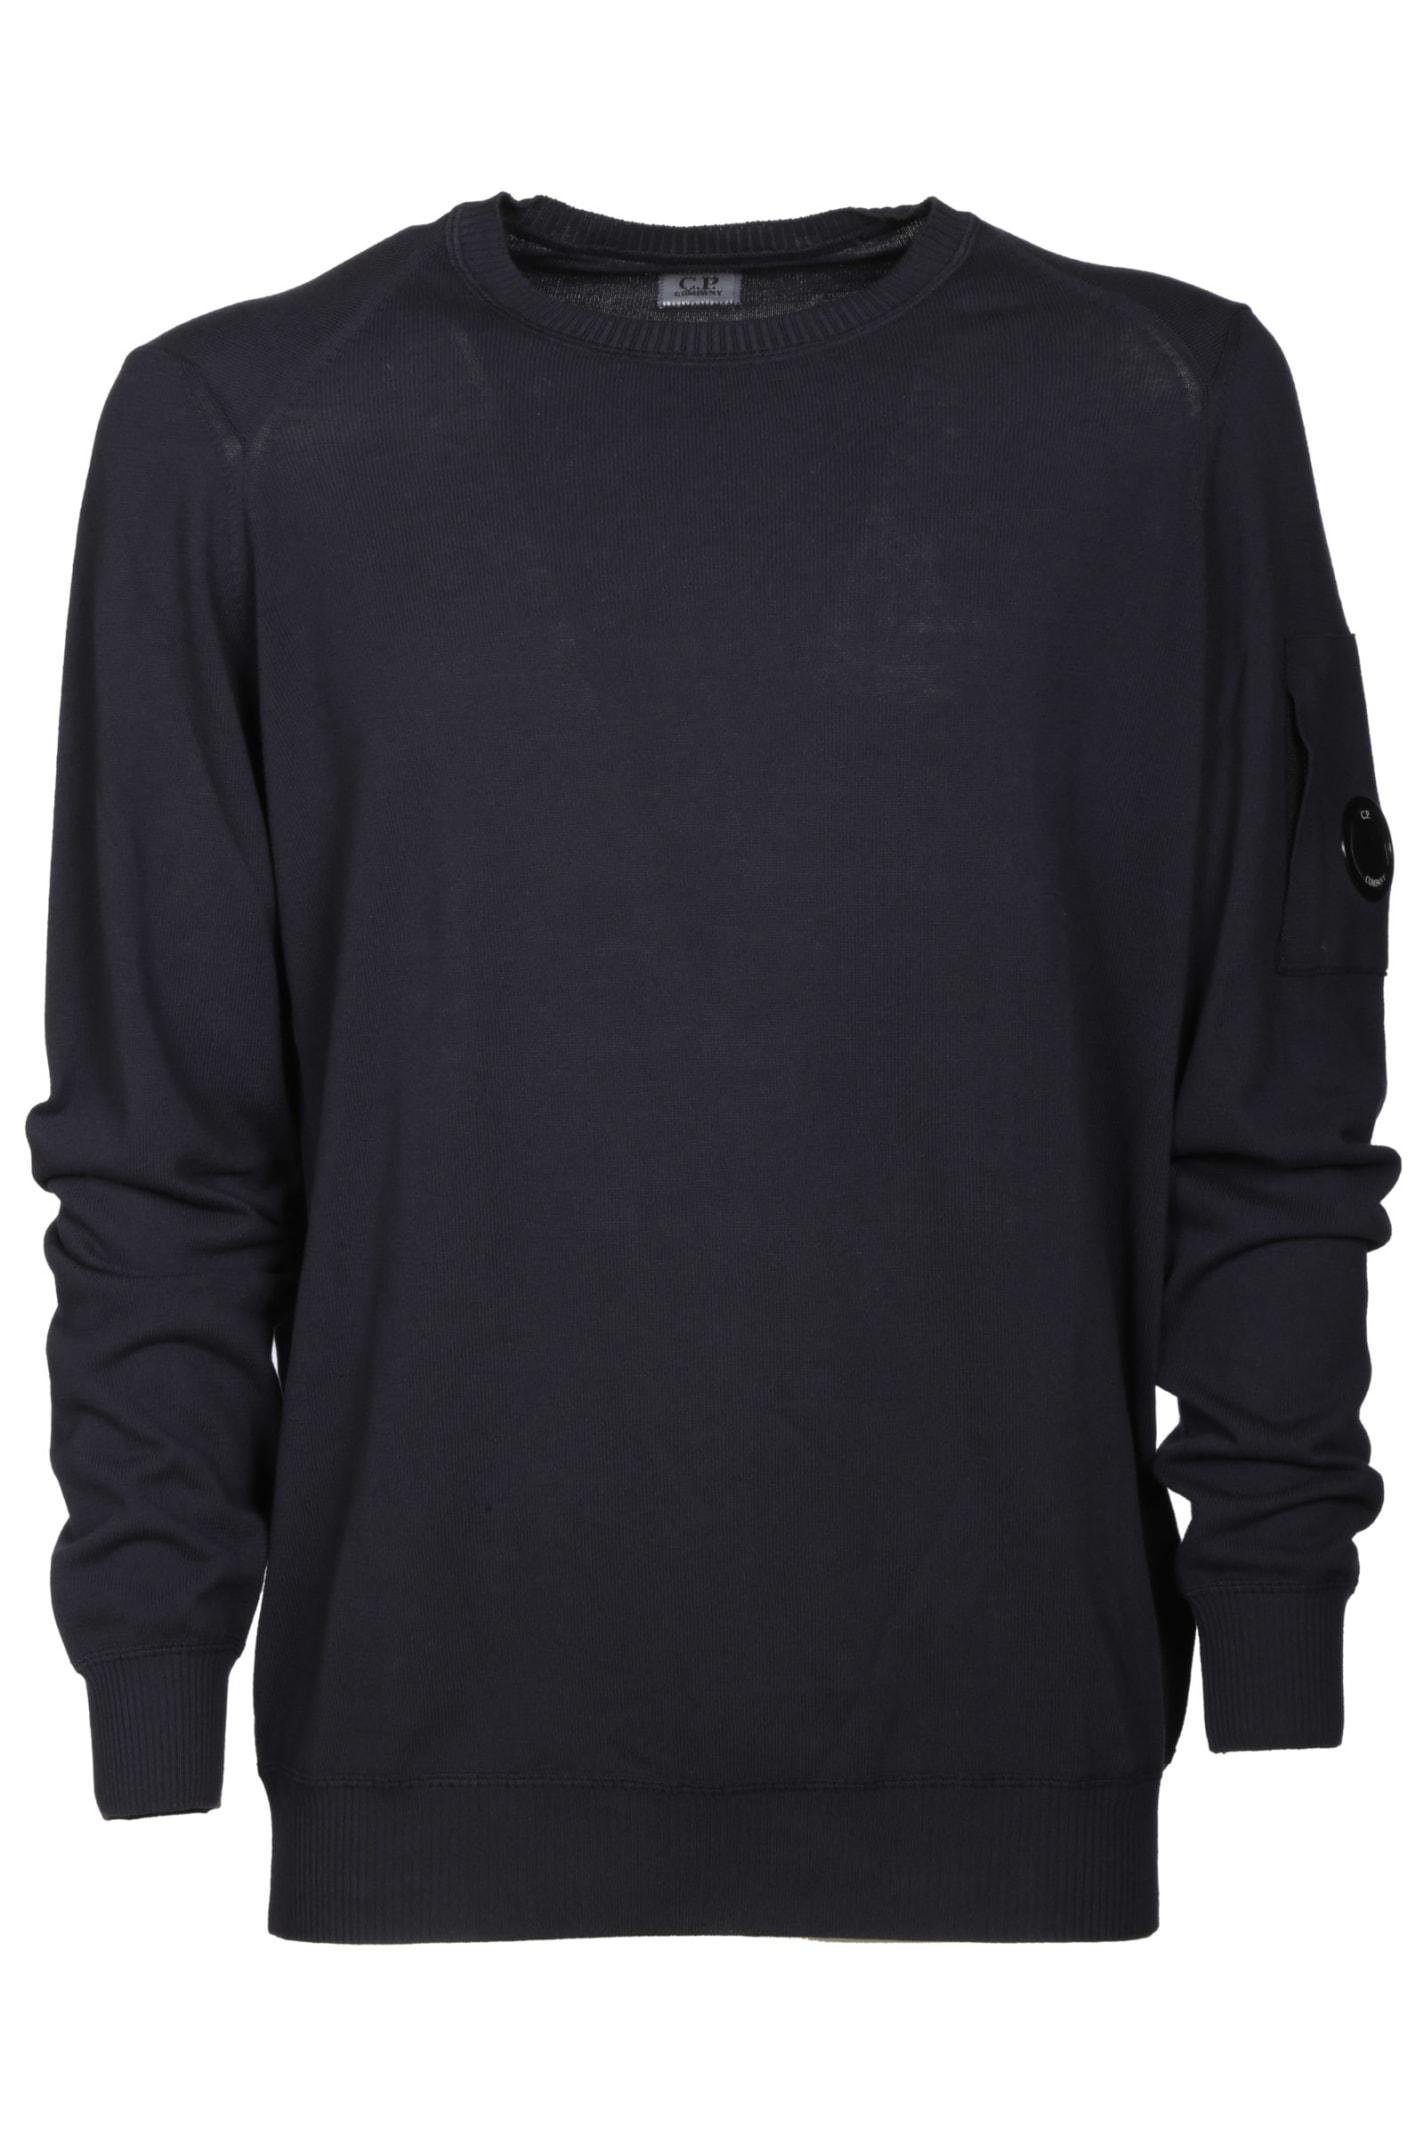 C.P. Company Ribbed Sweatshirt